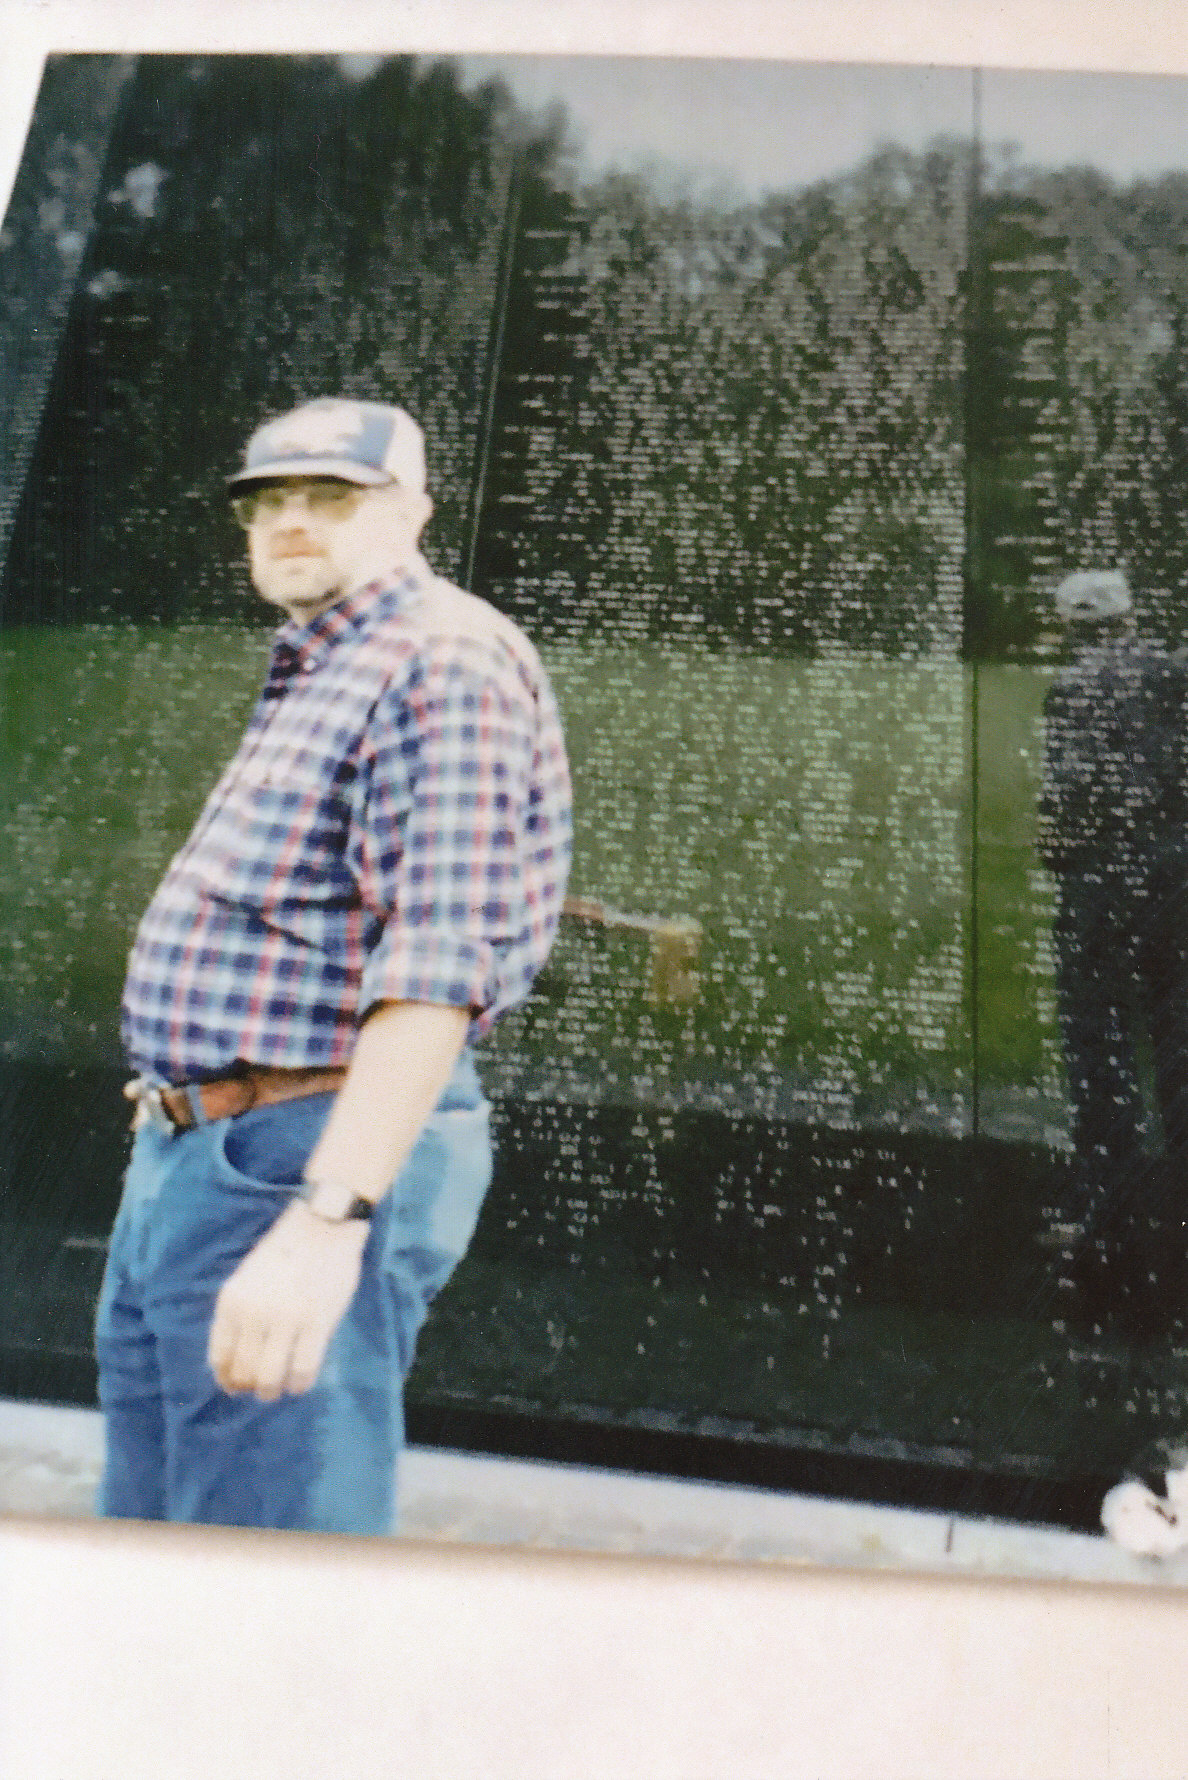 color photo of man standing in from of Vietnam Memorial